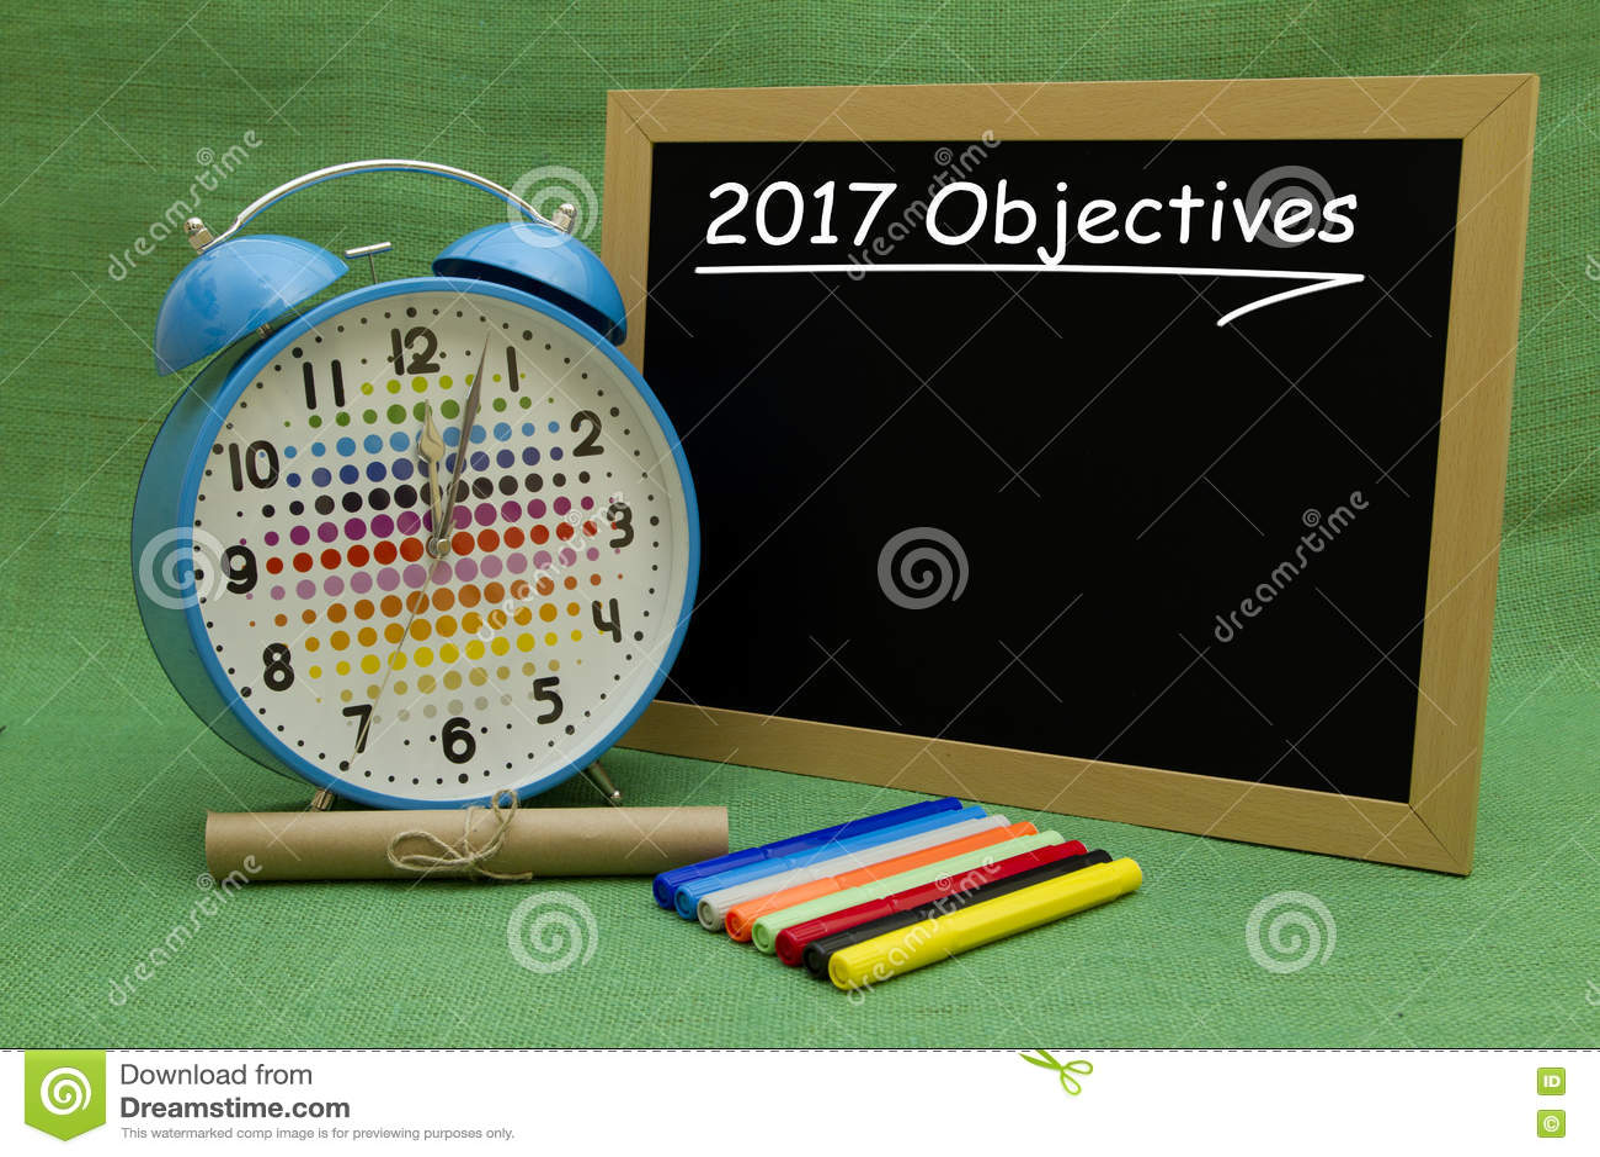 2017 New Year Objectives. Stock Photo - Image: 79173375